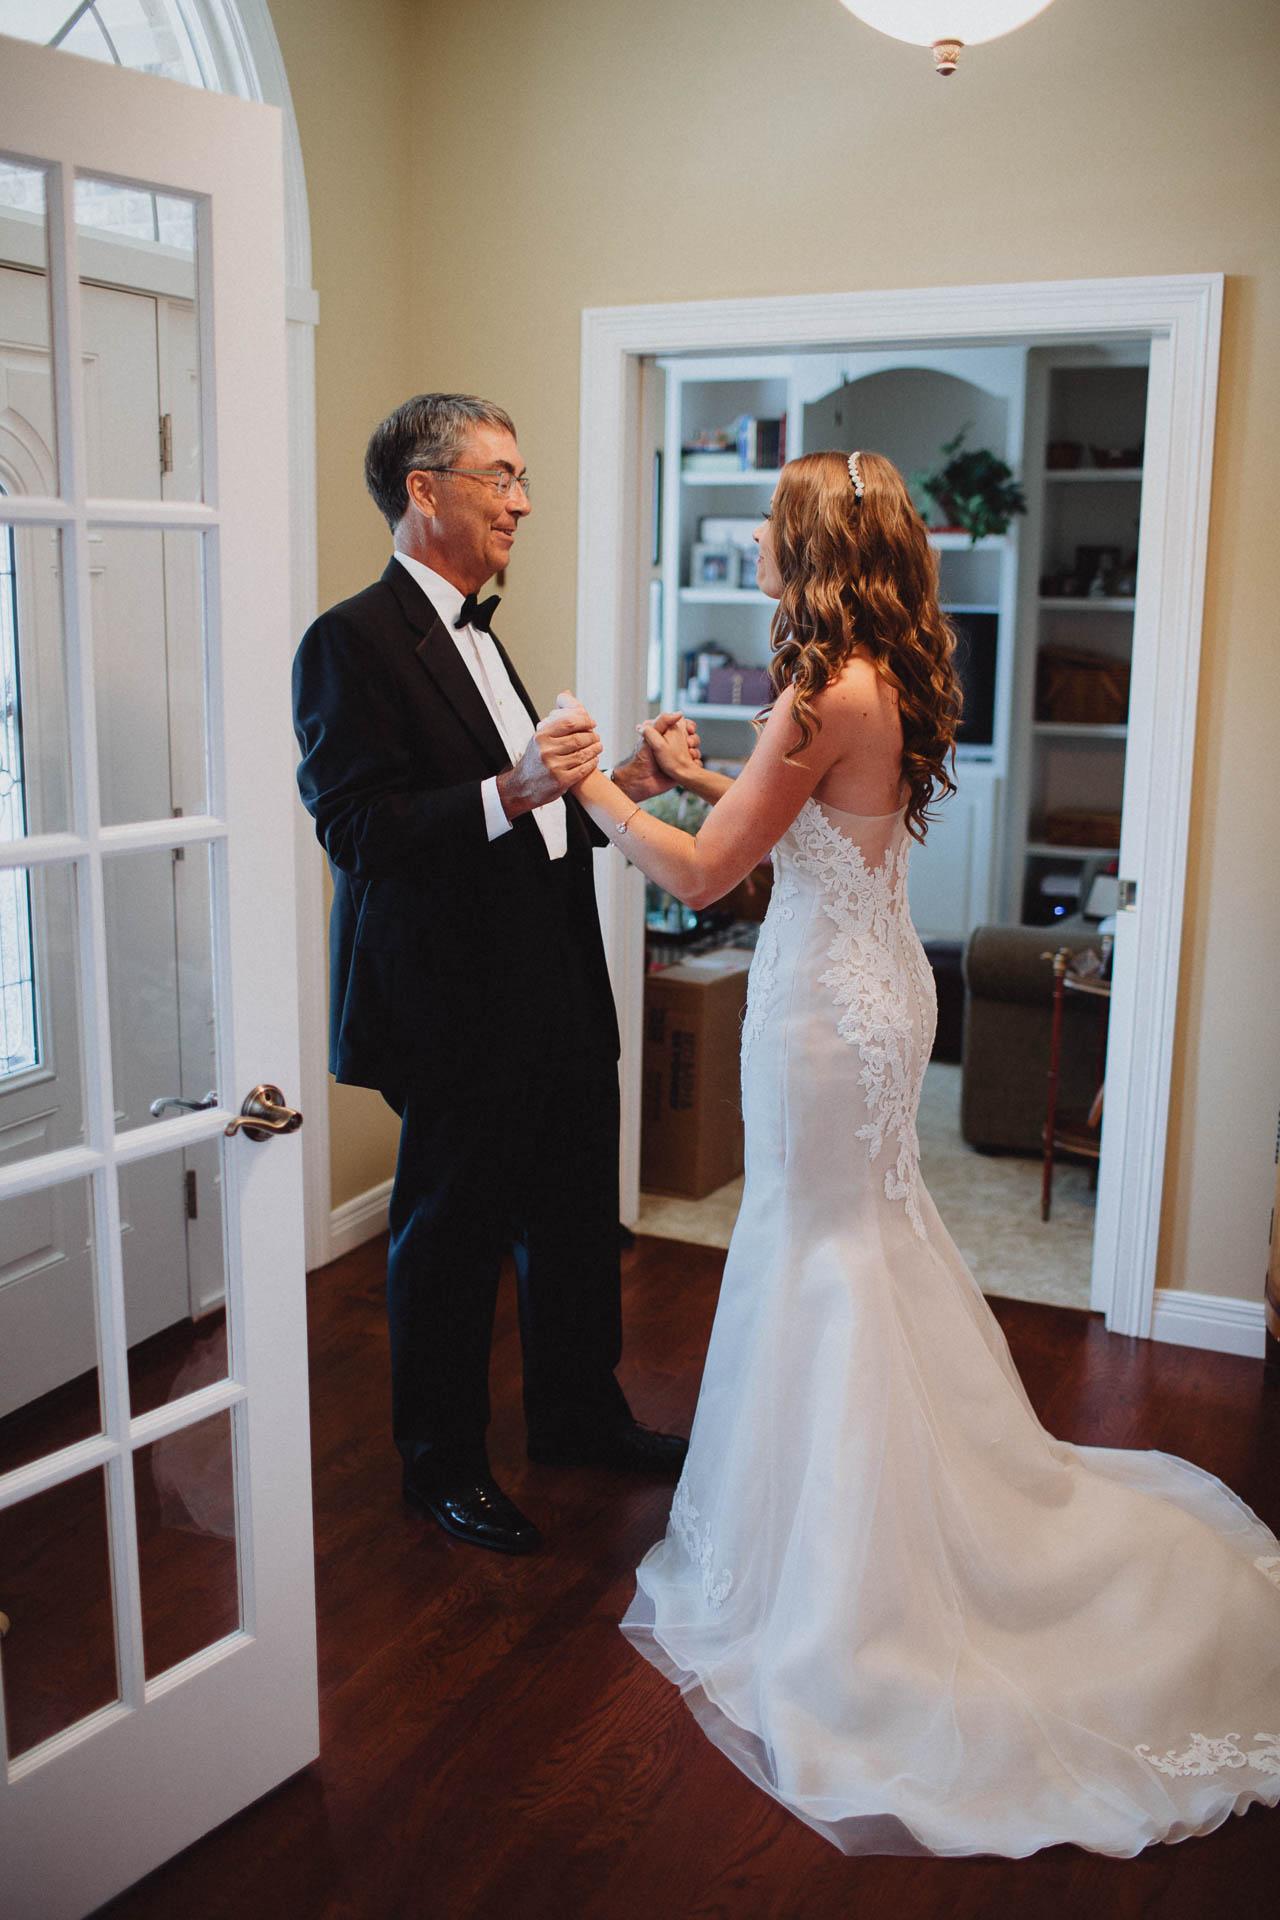 Keri-Joseph-Downtown-Dayton-Wedding-TopoftheMarket-017@2x.jpg